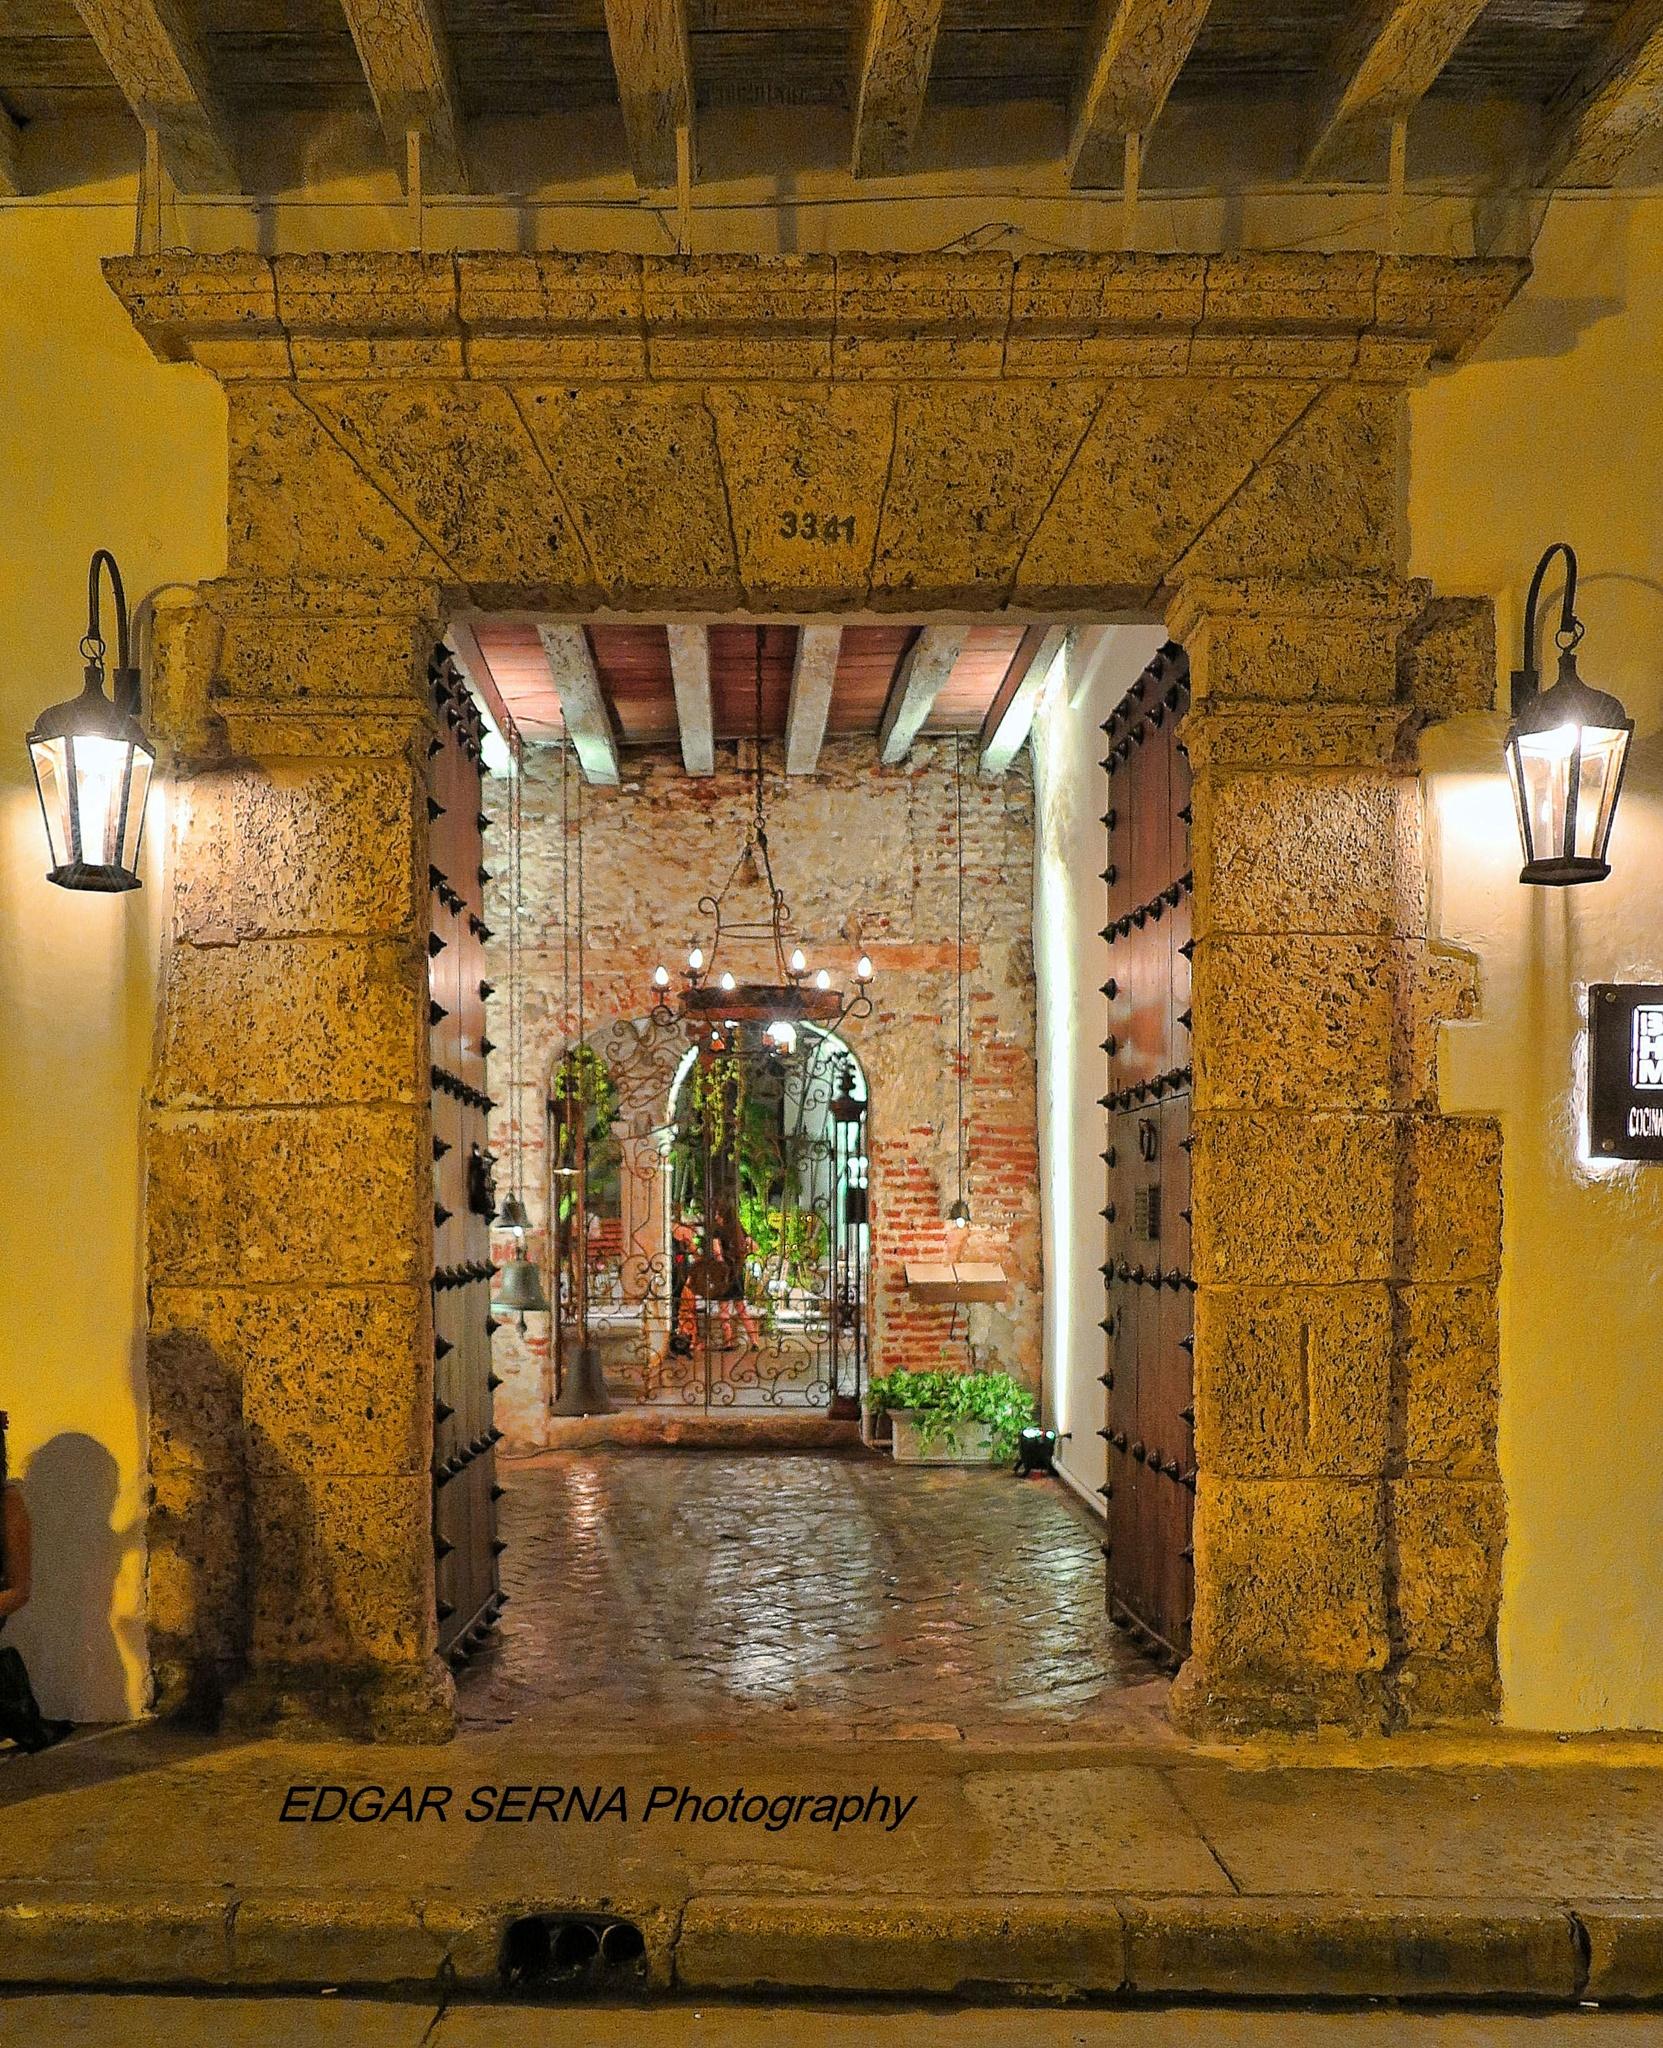 Entrance by Edgar Serna